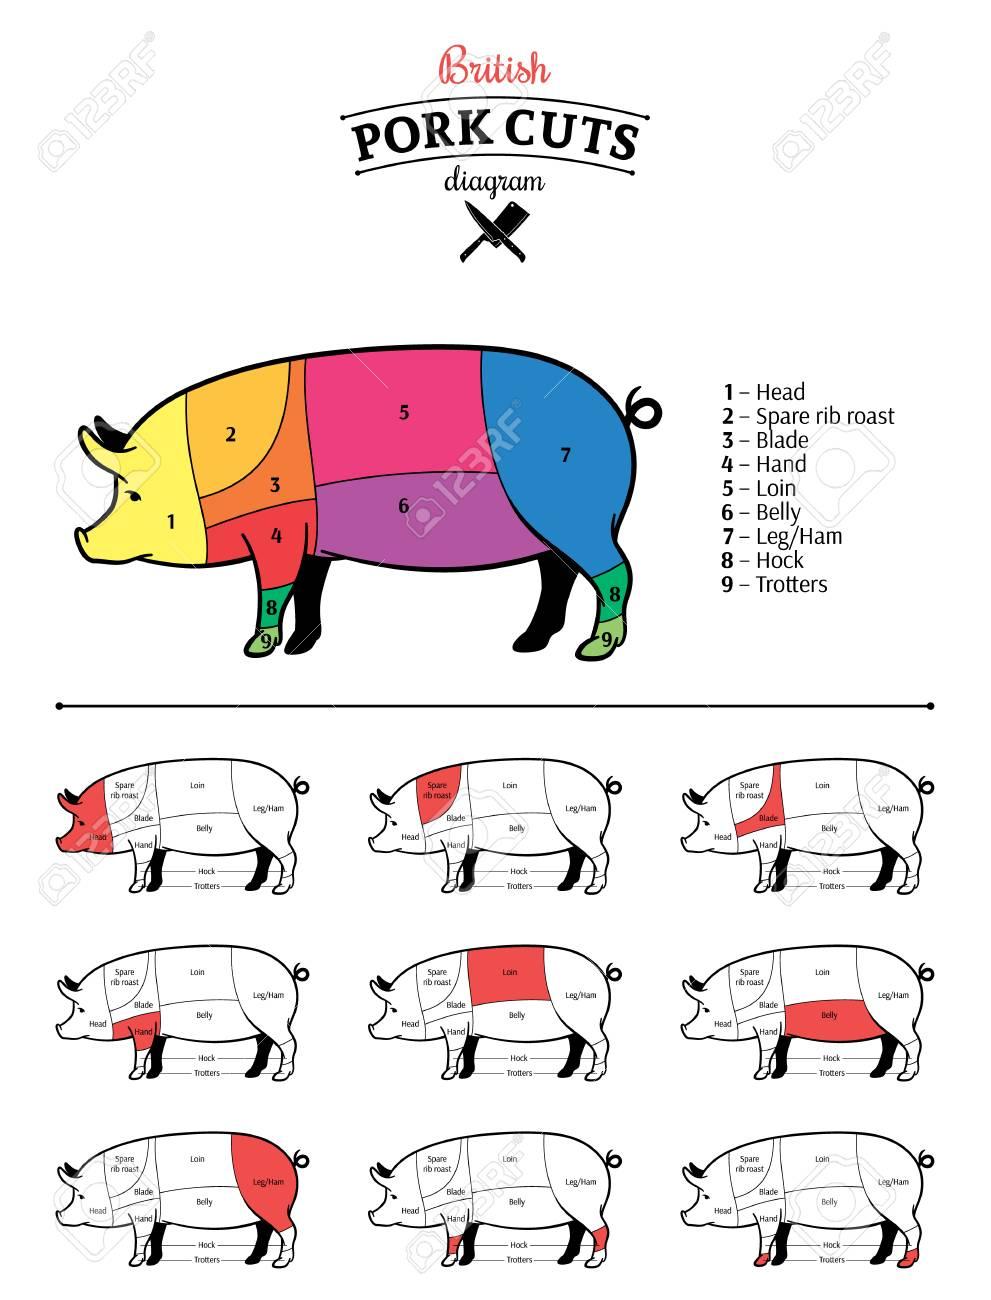 hight resolution of british pork cuts diagram stock vector 115010725